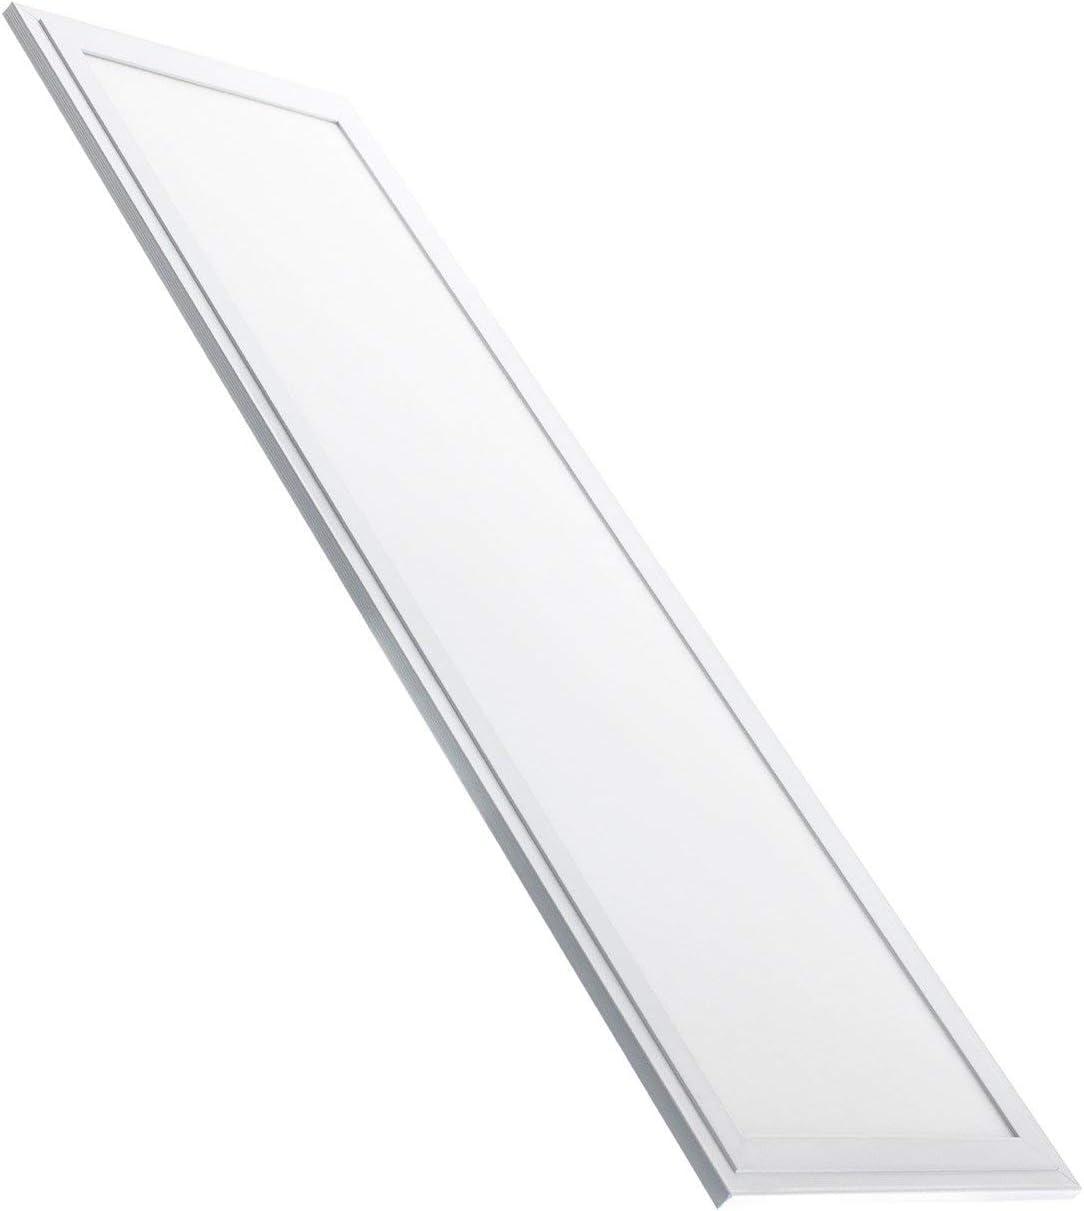 Panel LED Slim 120x30cm 40W 5200lm High Lumen Blanco Neutro 4000K - 4500K